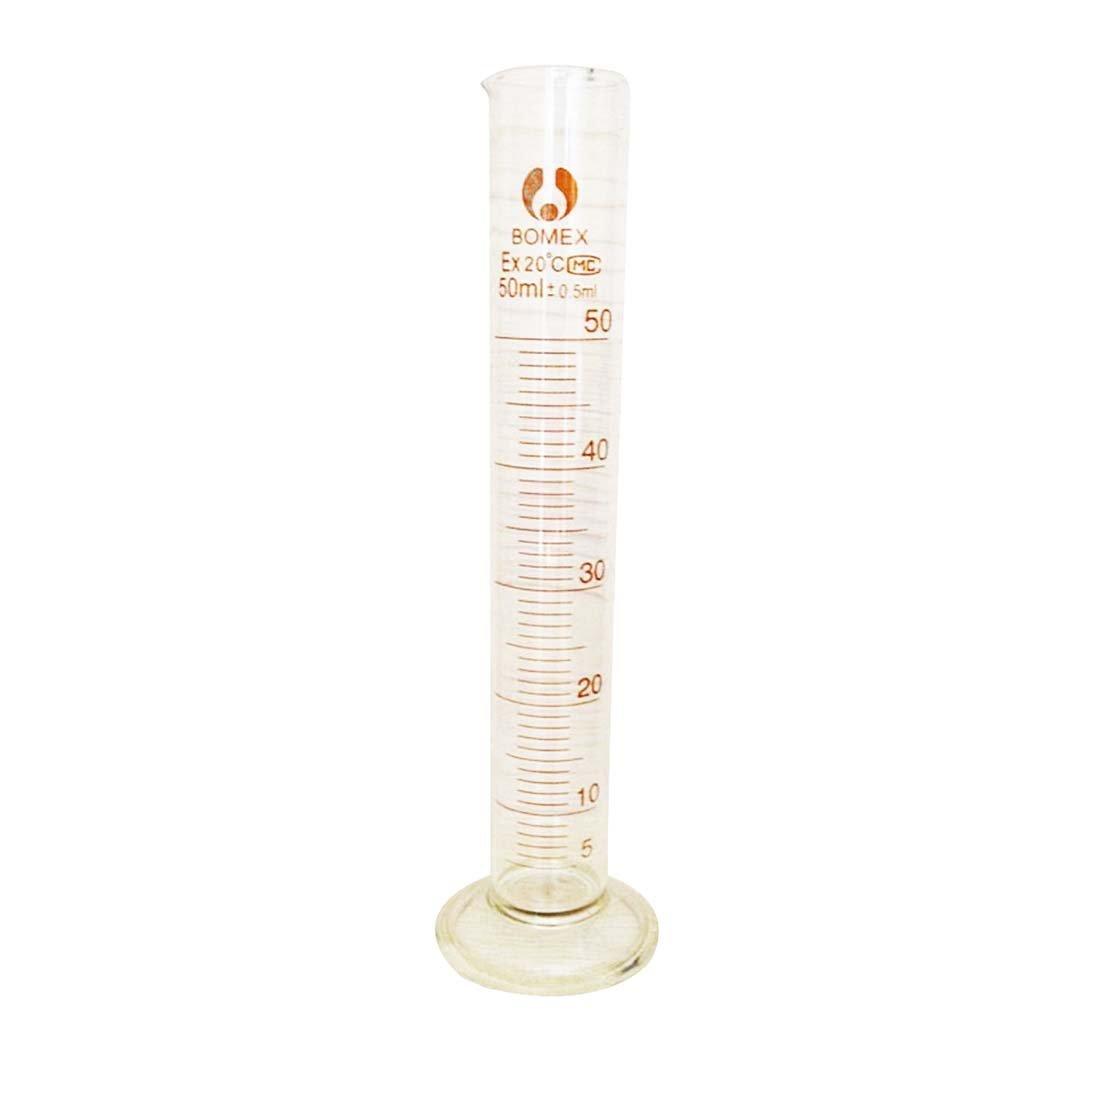 SODIAL(R) 5ml Graduated Glass Measuring Cylinder Chemistry Laboratory Measure LEPAZIK2873